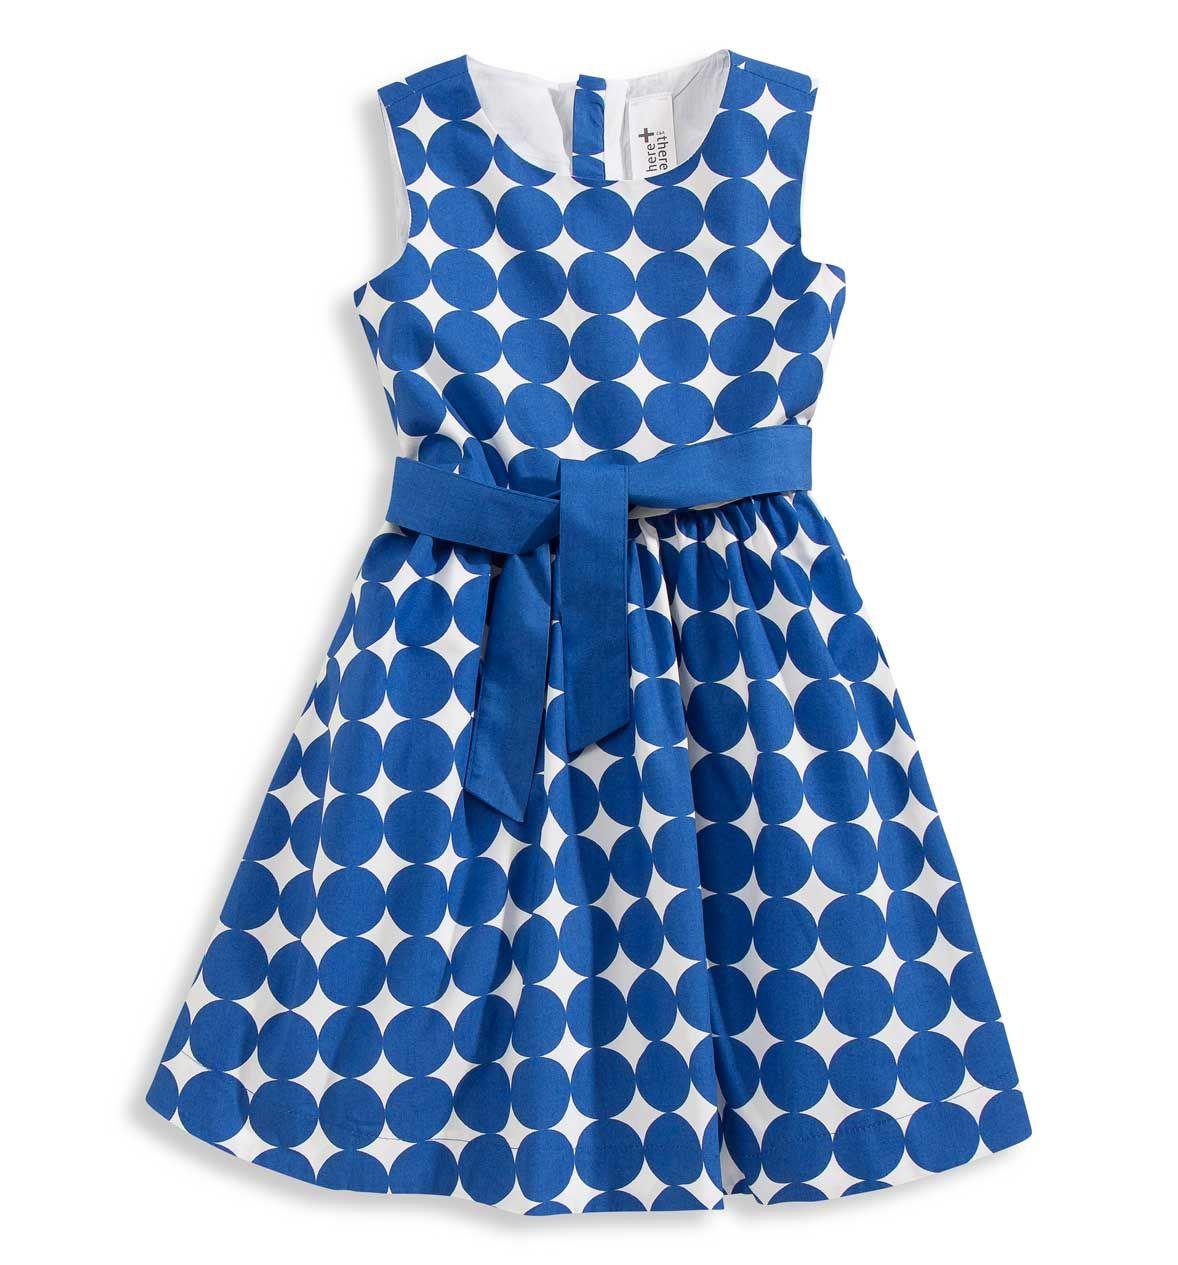 Kleid In Blau Weiss Kleid Blau Weiss Modestil Blau Weiss Gestreiftes Kleid